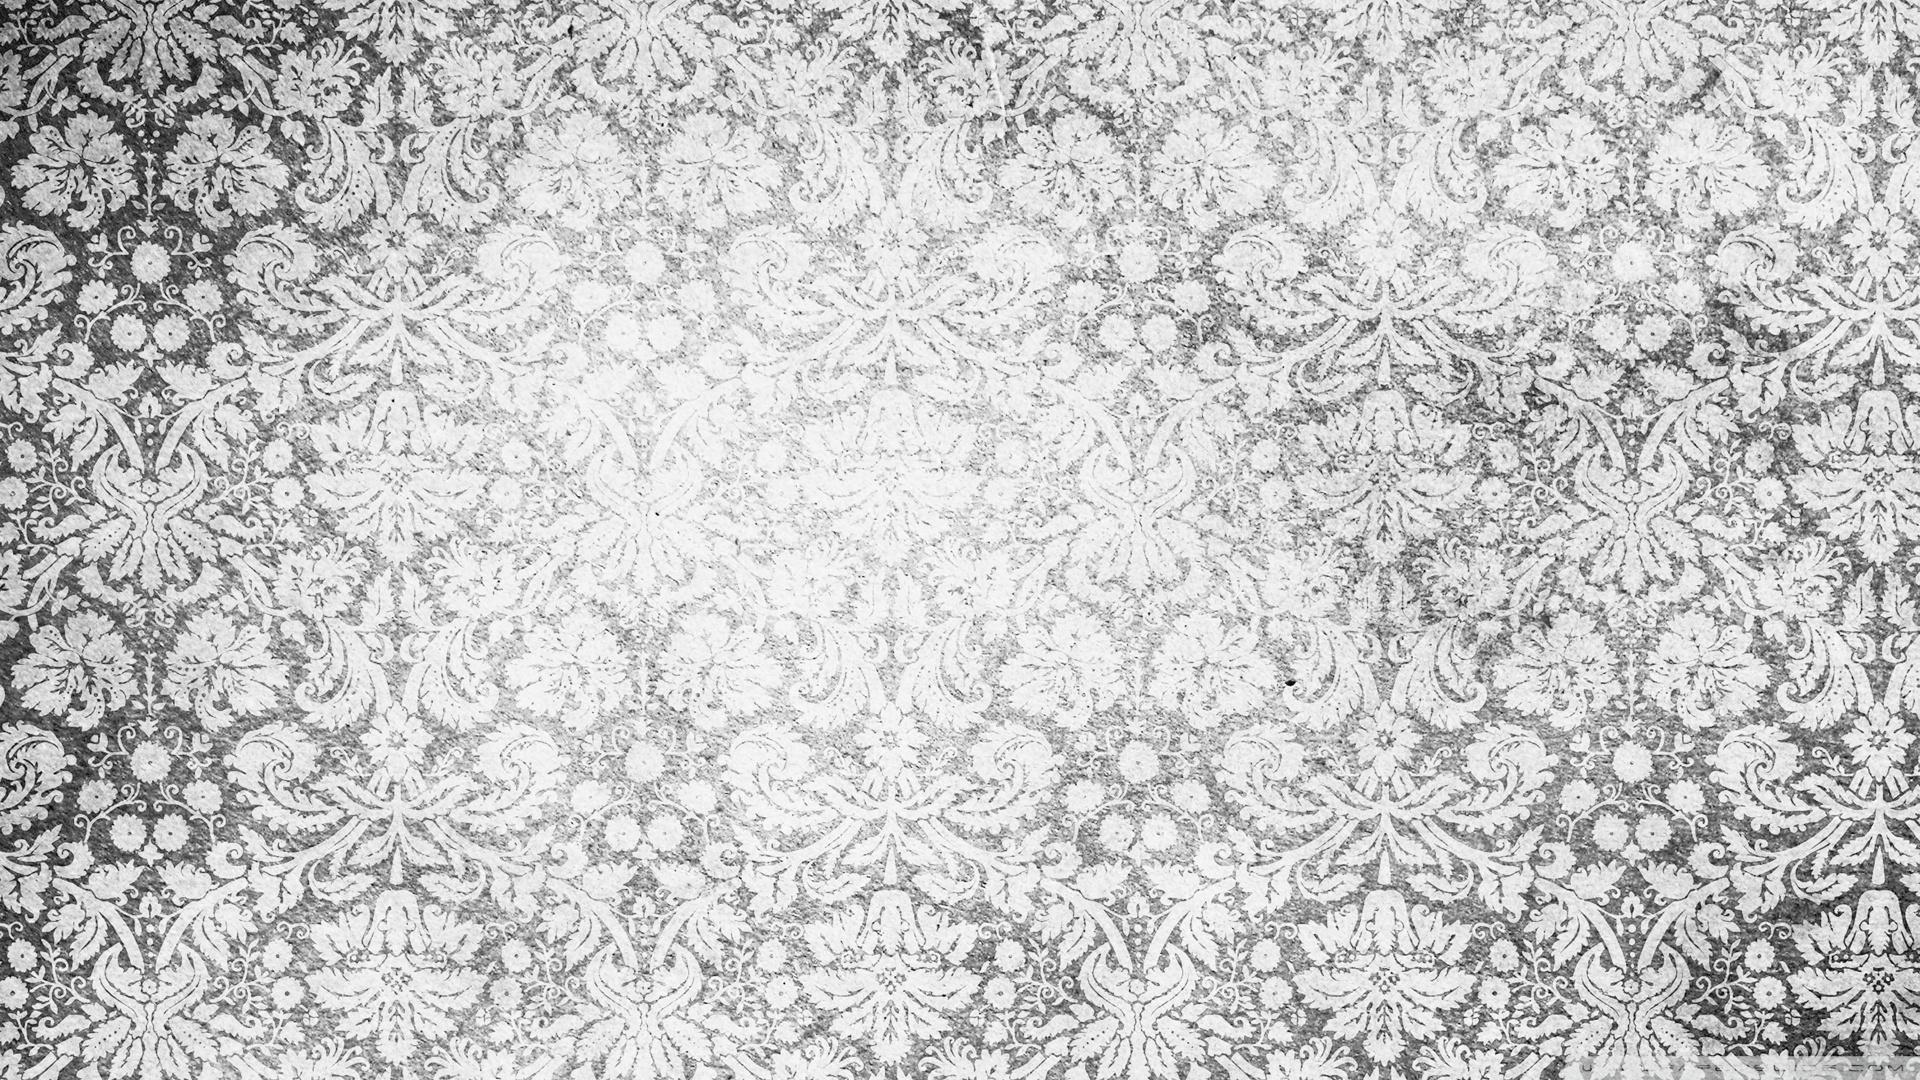 Black and White Vintage Patterns